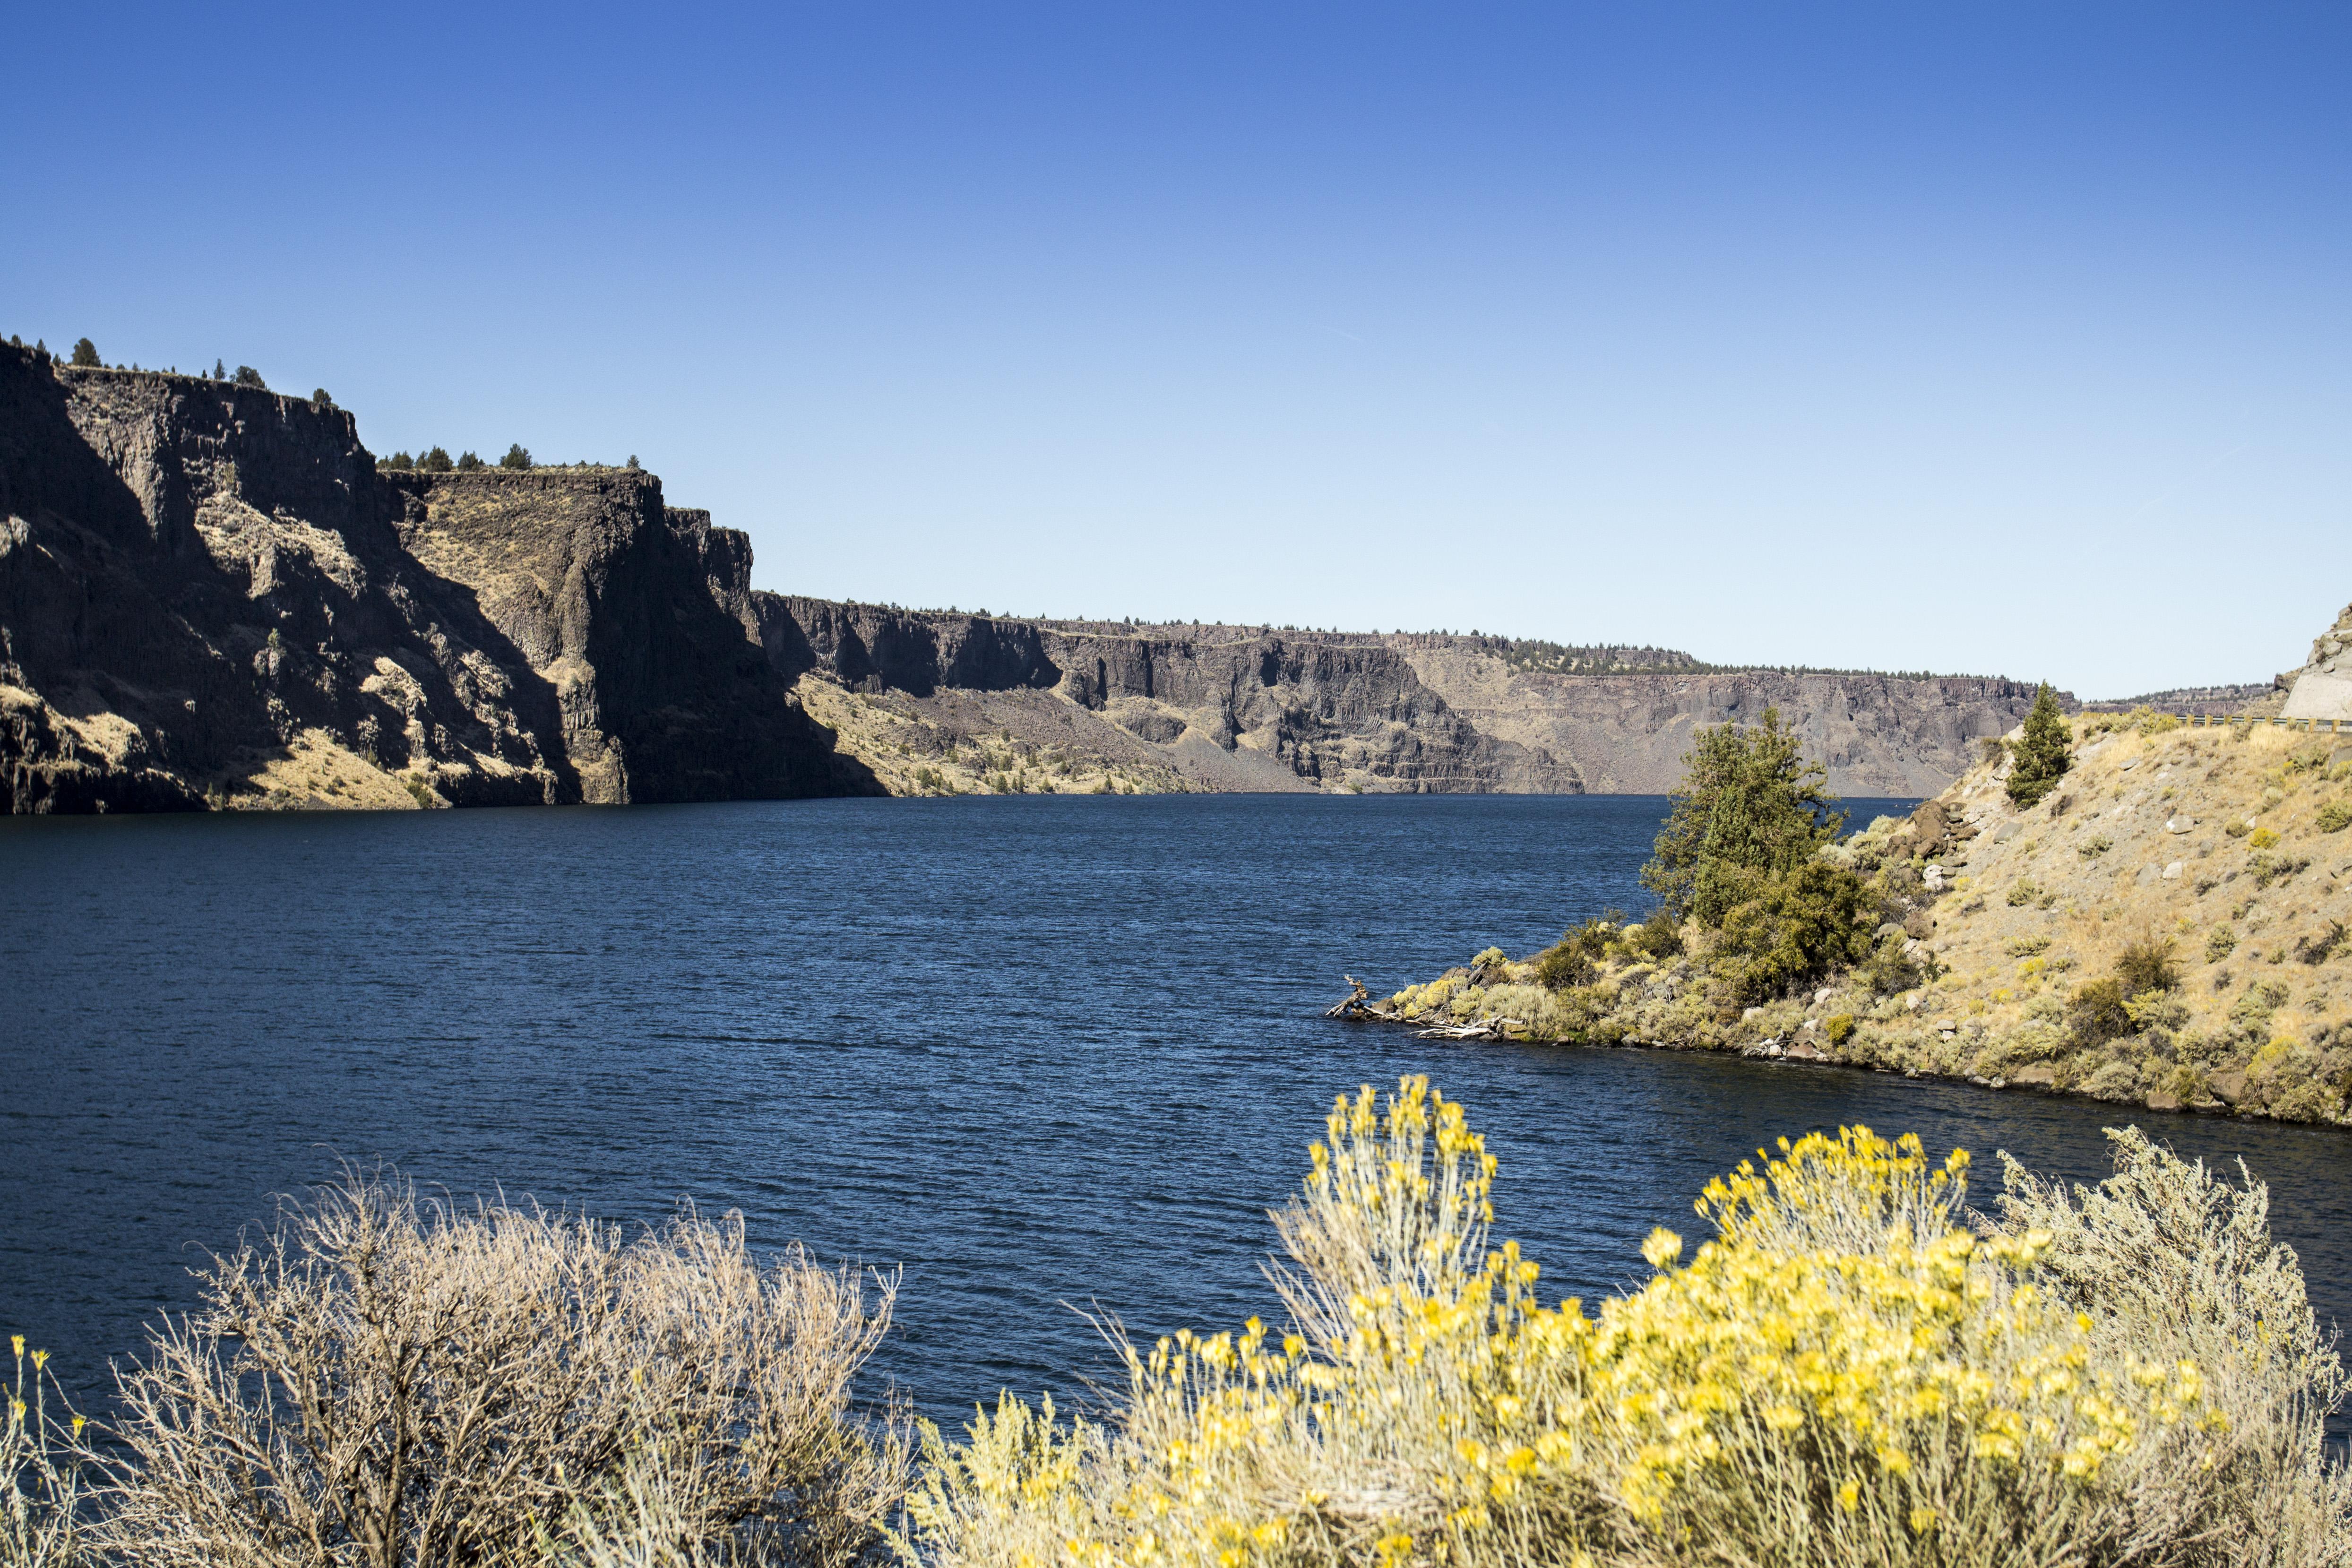 Lake Billy Chinook, Oregon, Bluff, Cliff, Desert, Grass, HQ Photo